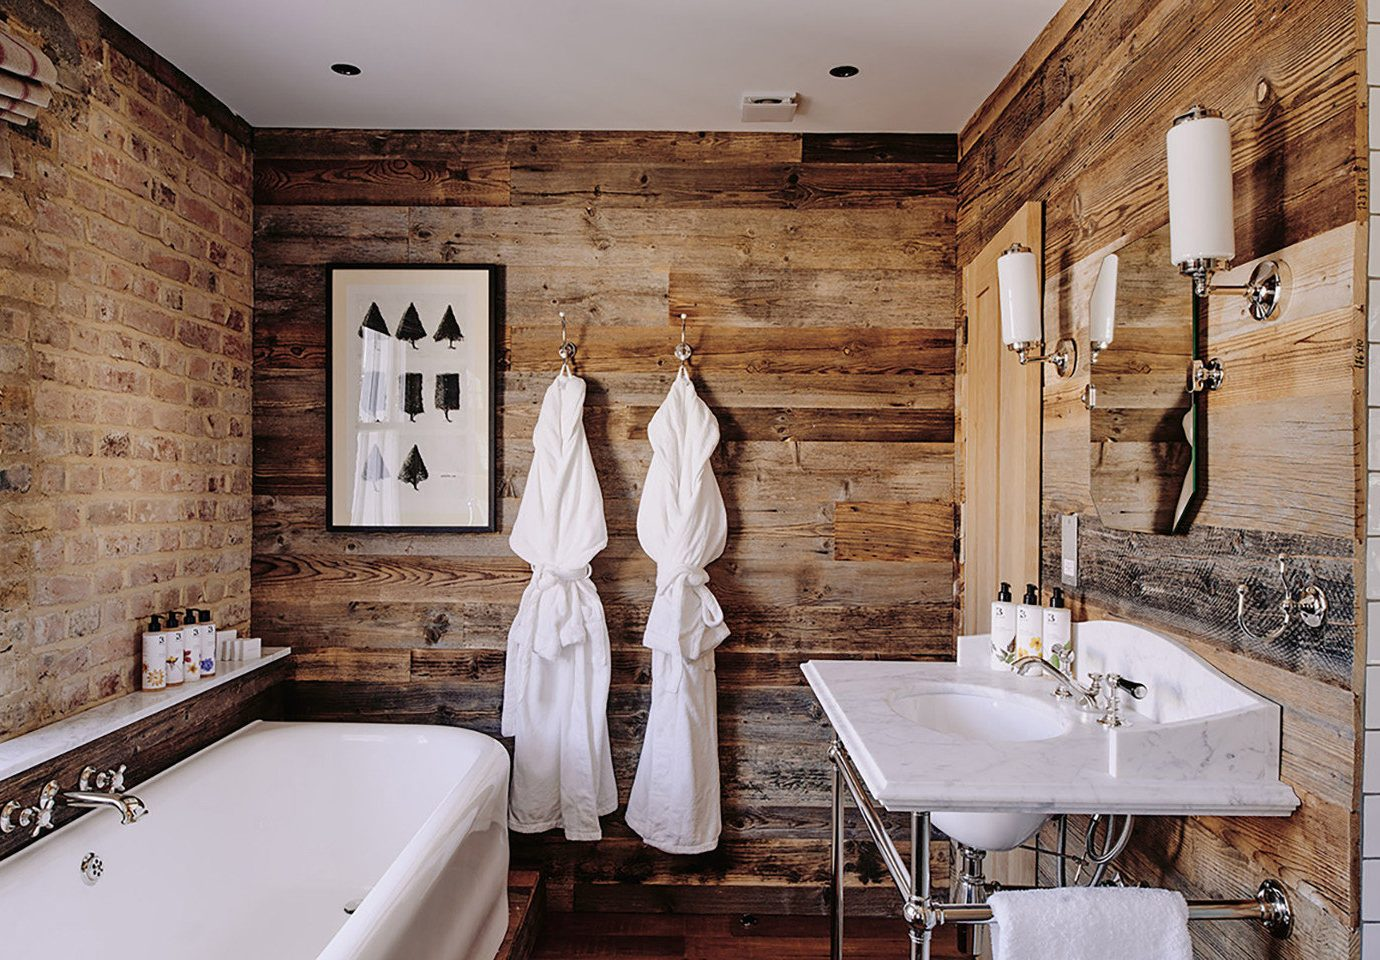 Boutique Hotels Hotels bathroom indoor wall sink room interior design tub home flooring floor bathtub tiled stone Bath tile